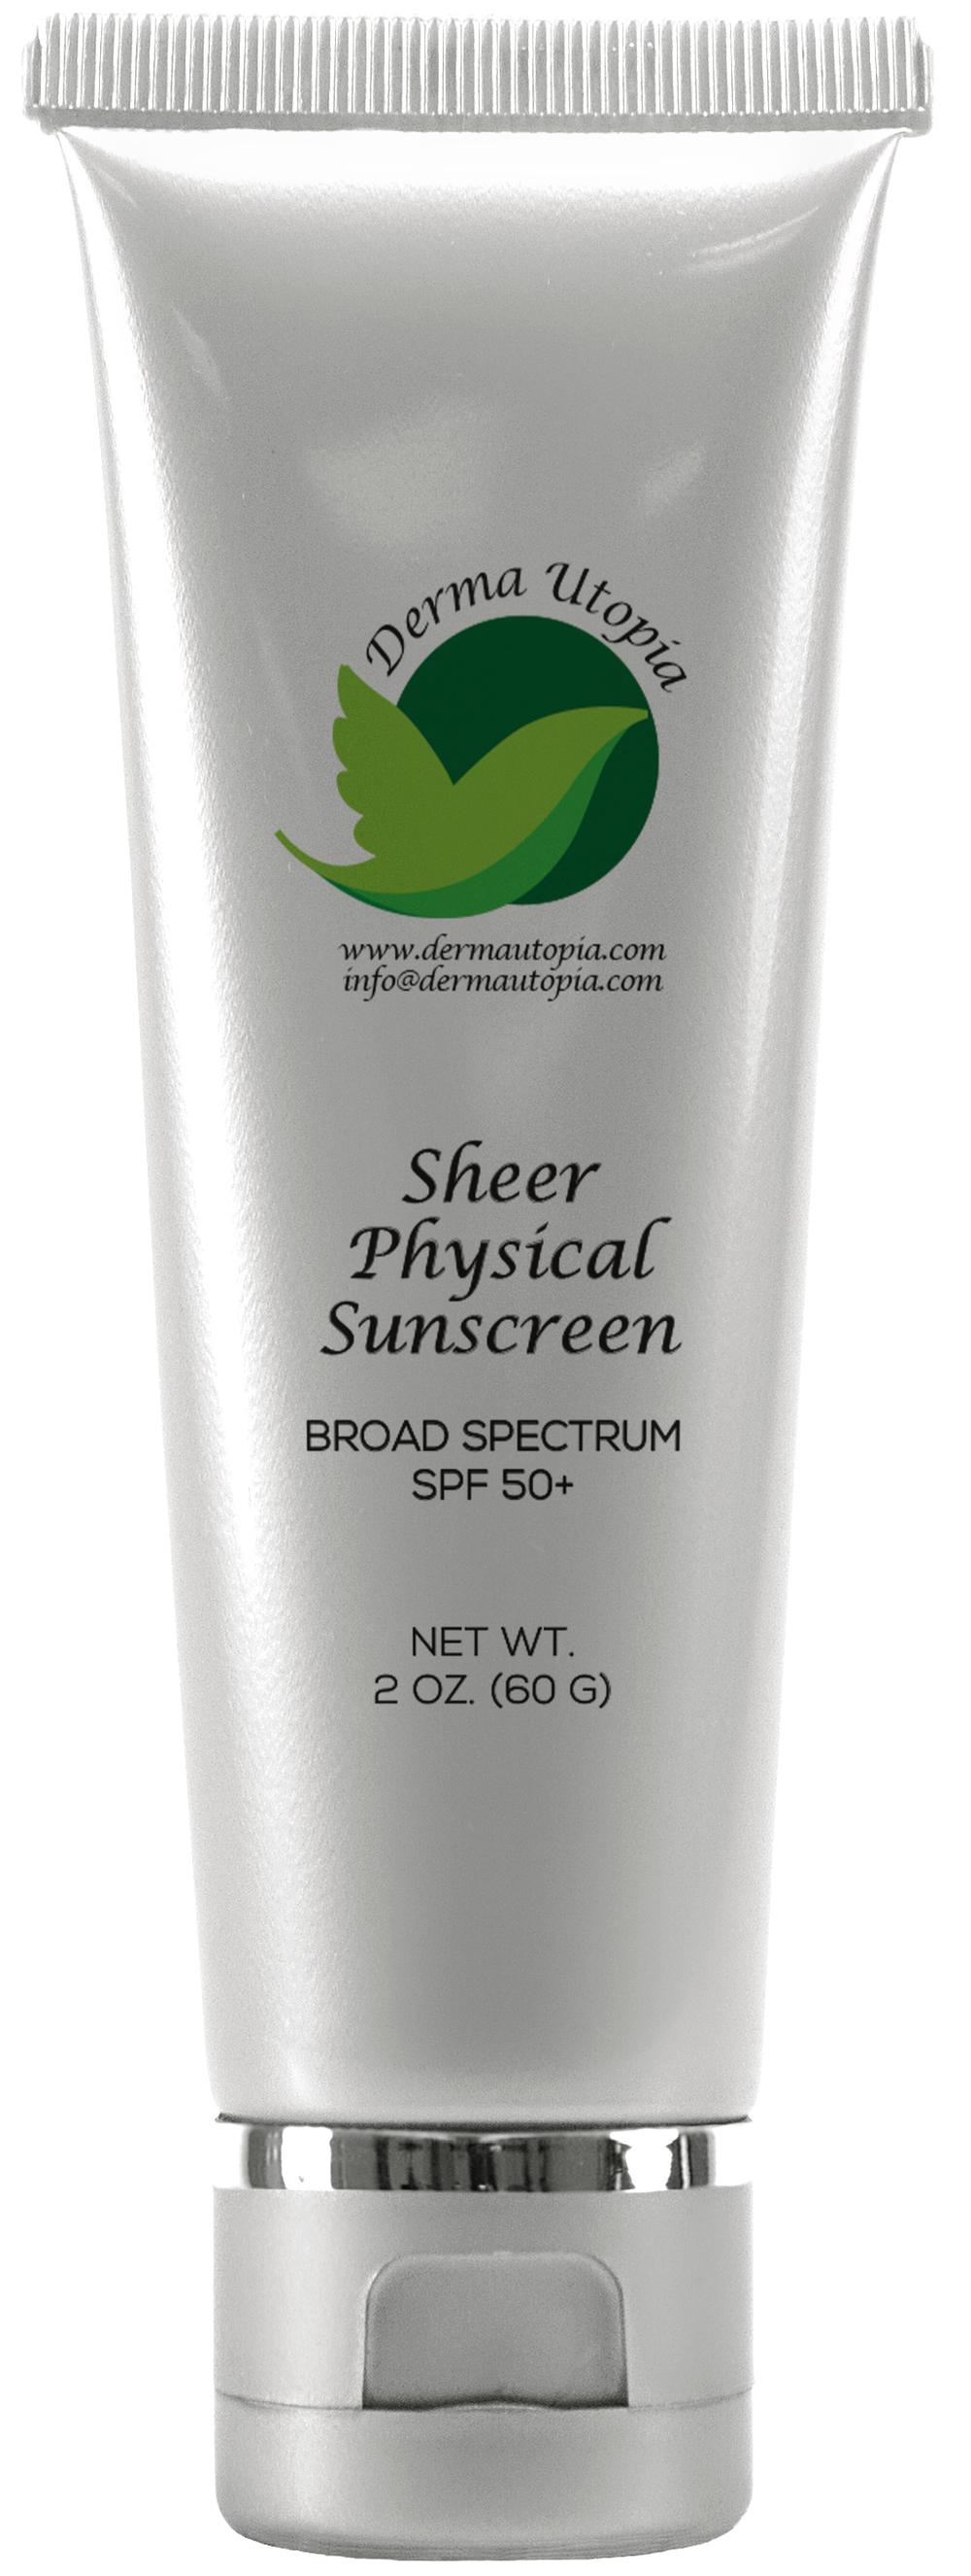 Sheer Physical Sunscreen.jpg